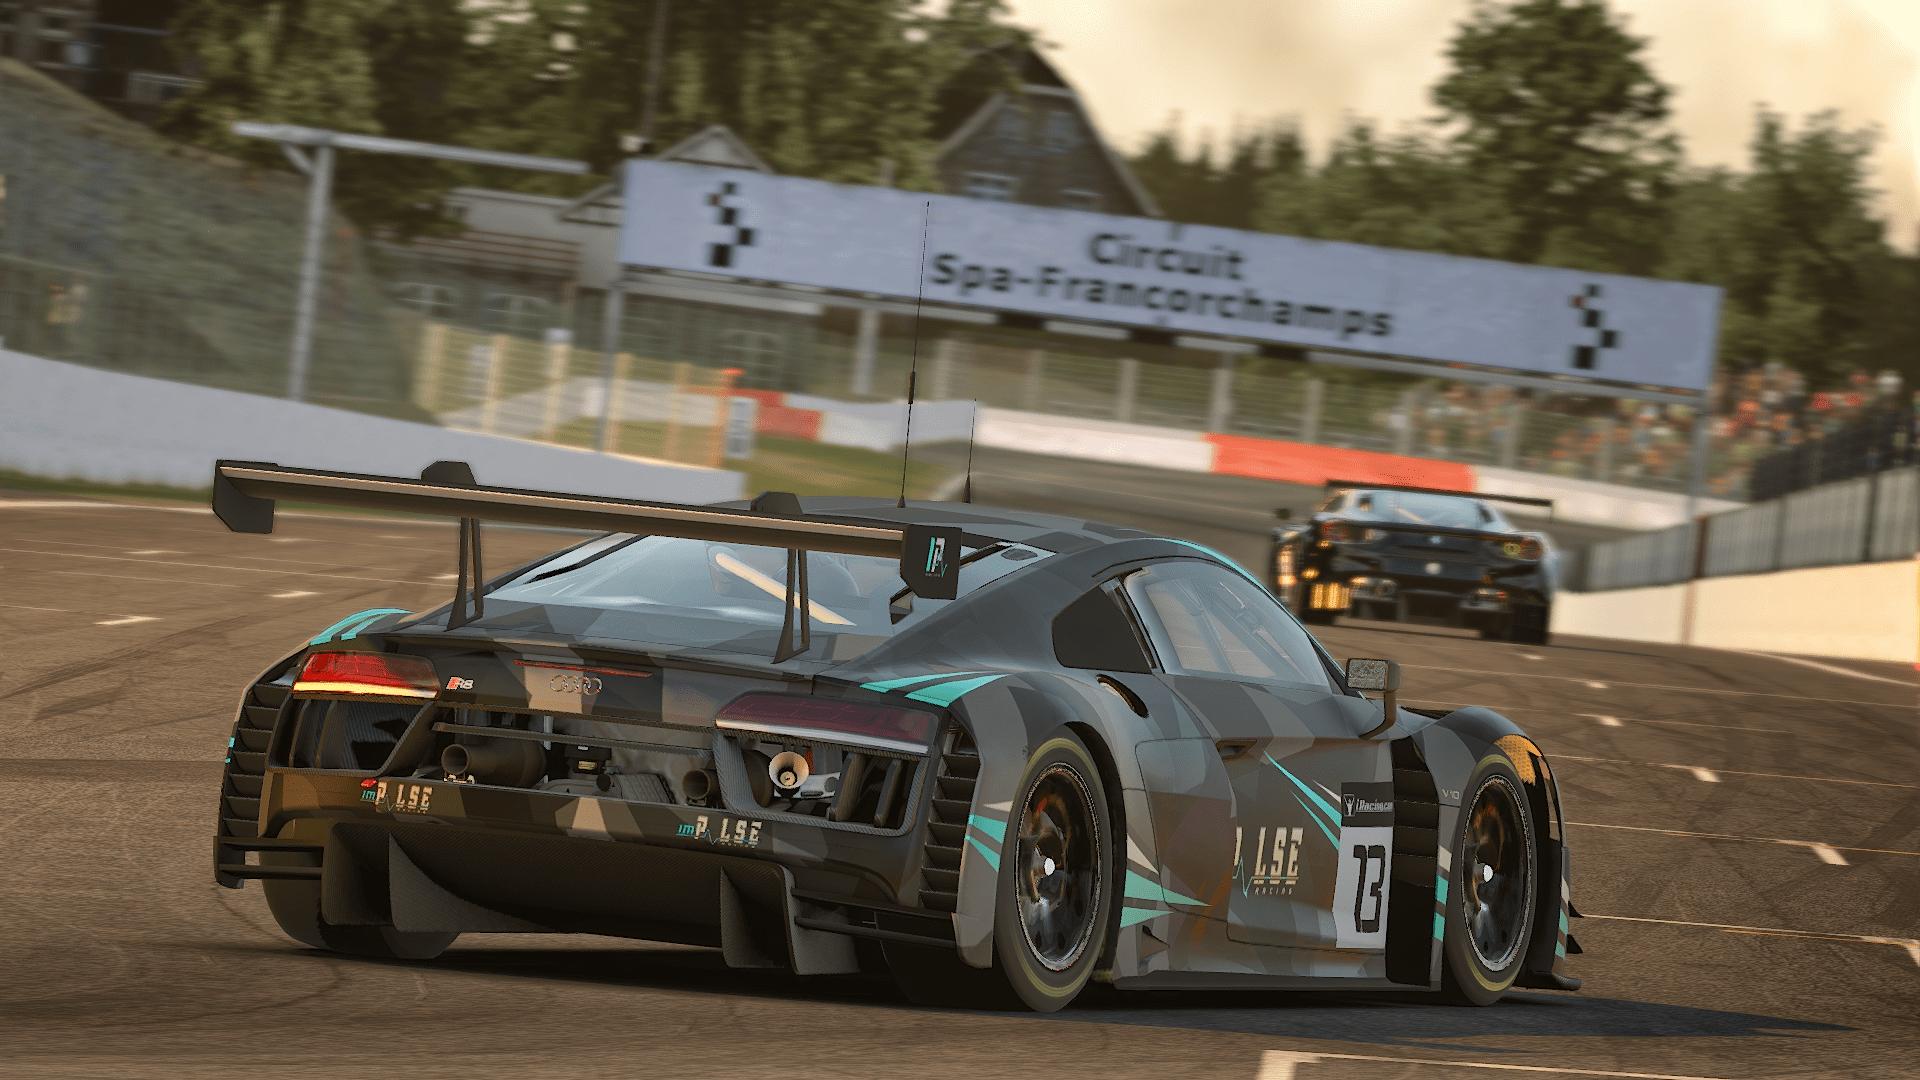 Audi GT3 Spa Start/Finish